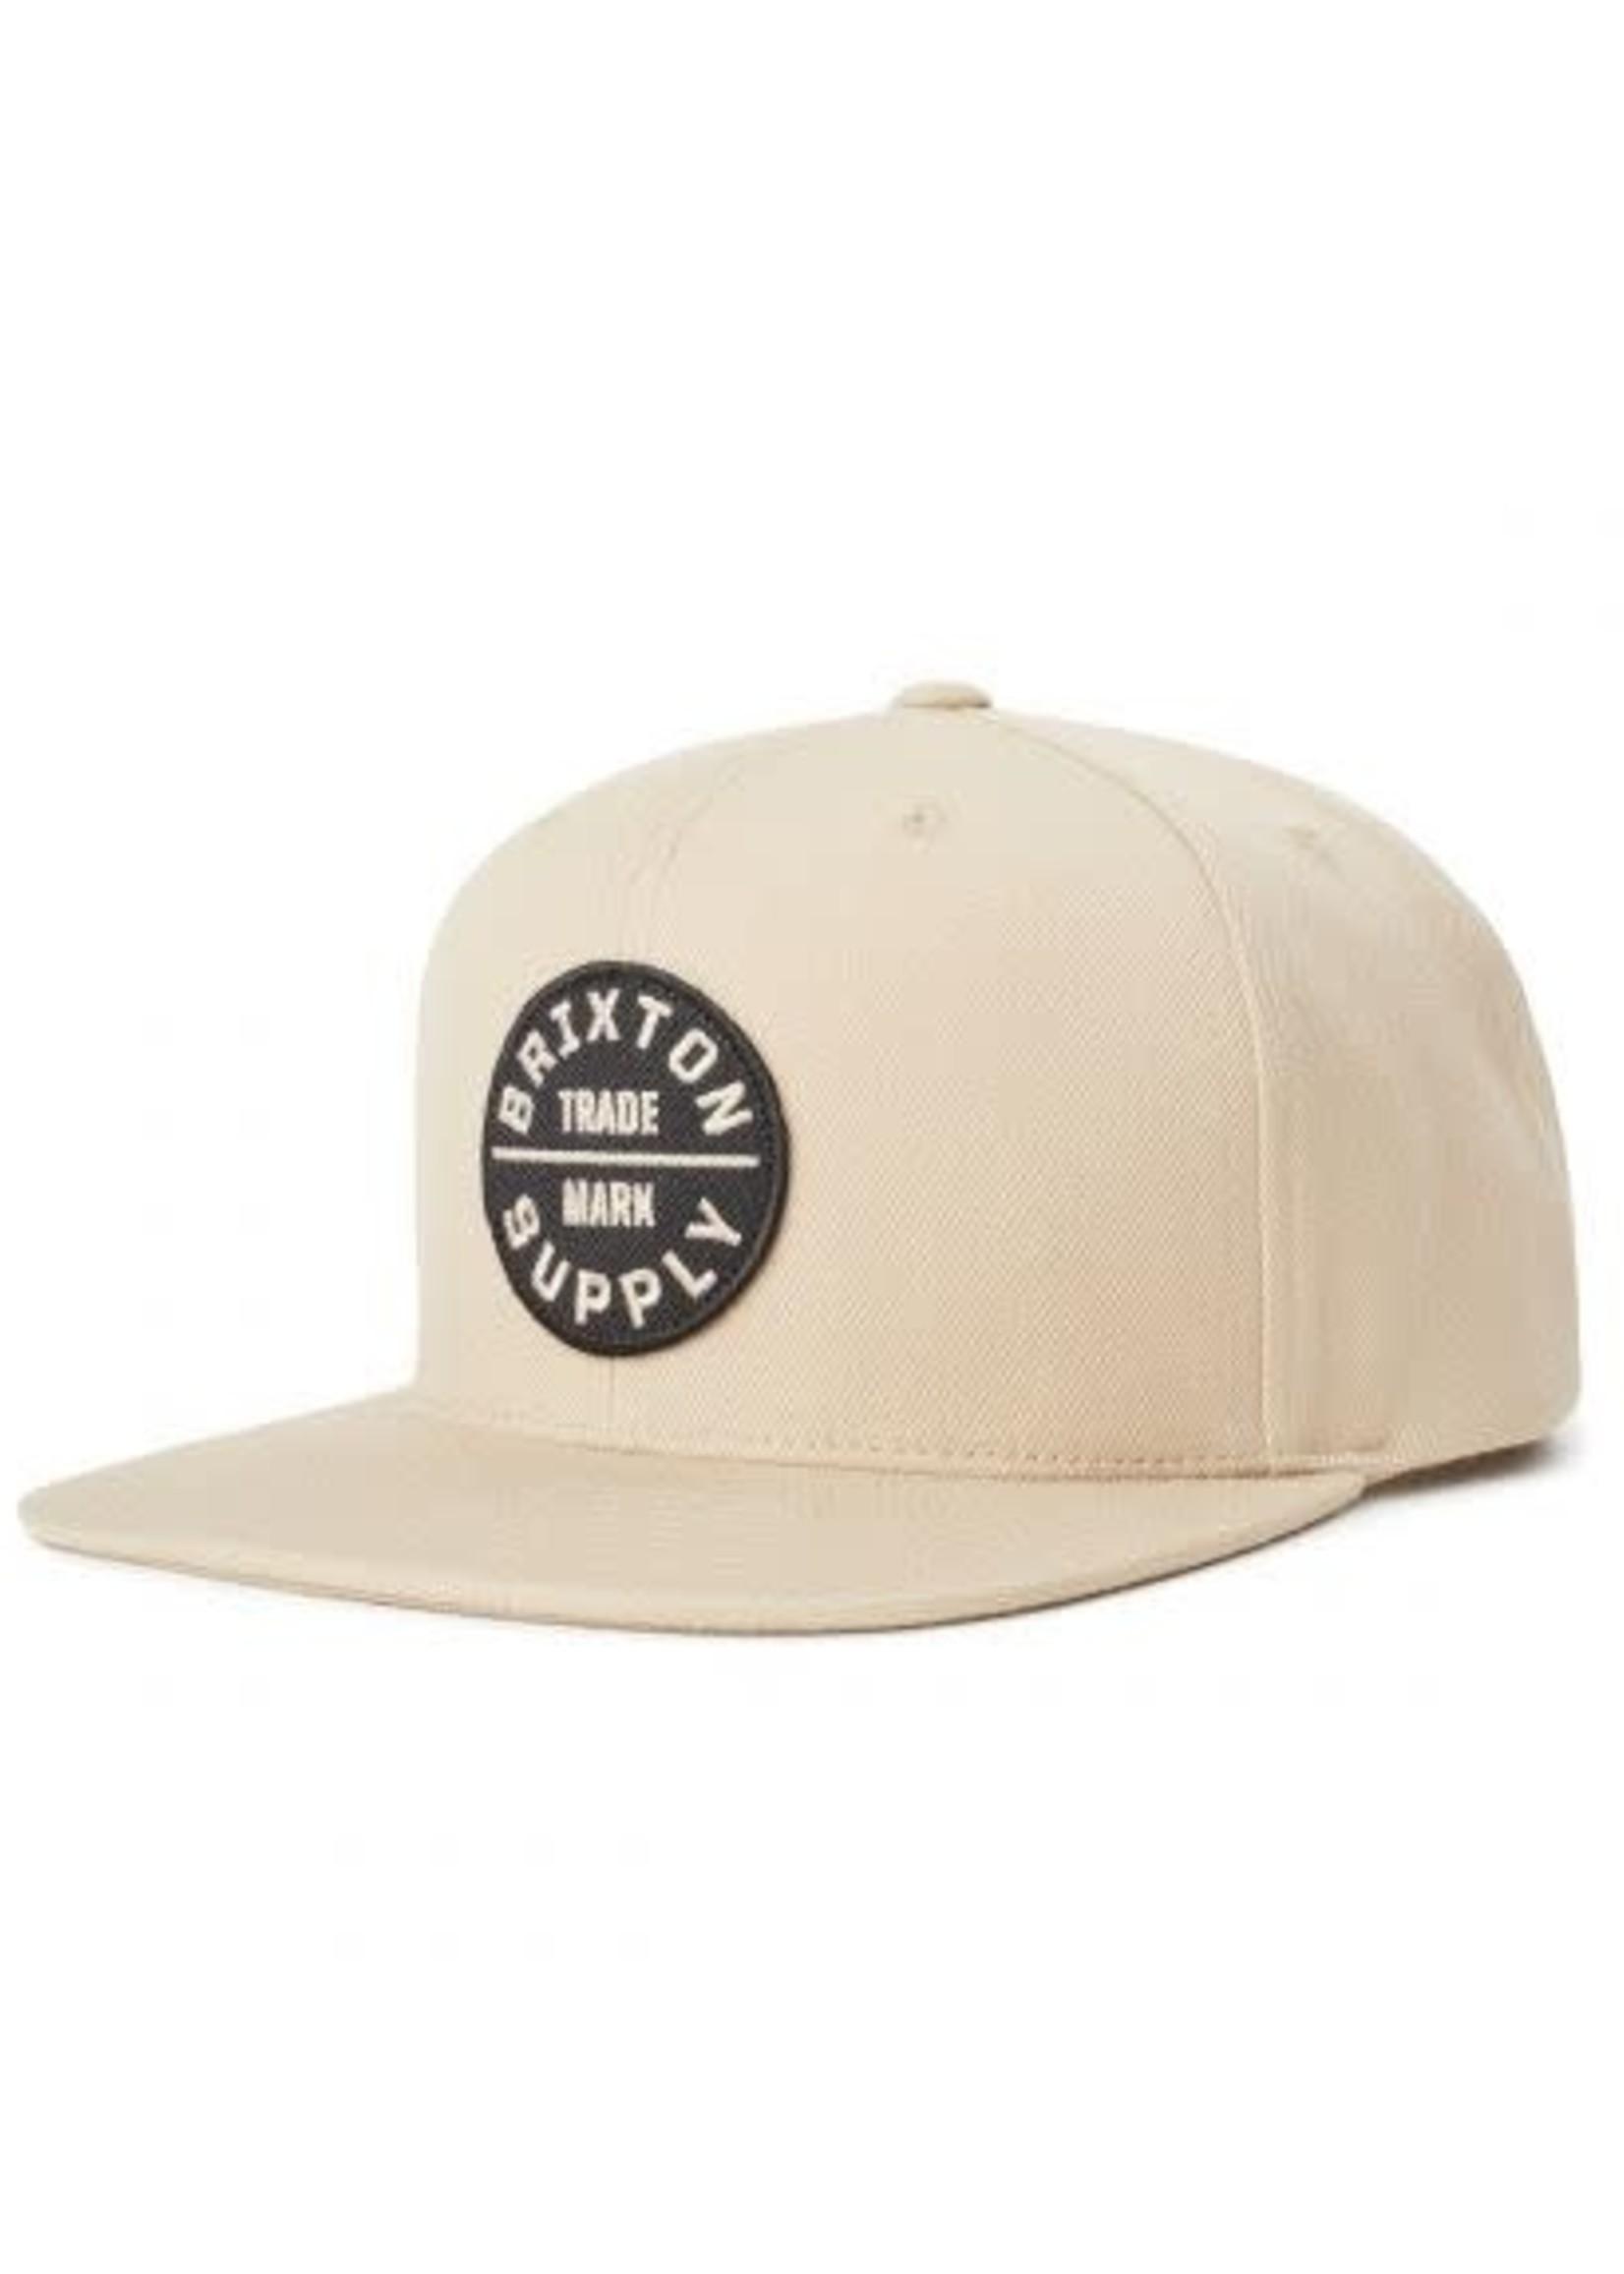 BRIXTON OATH II Snapback hat